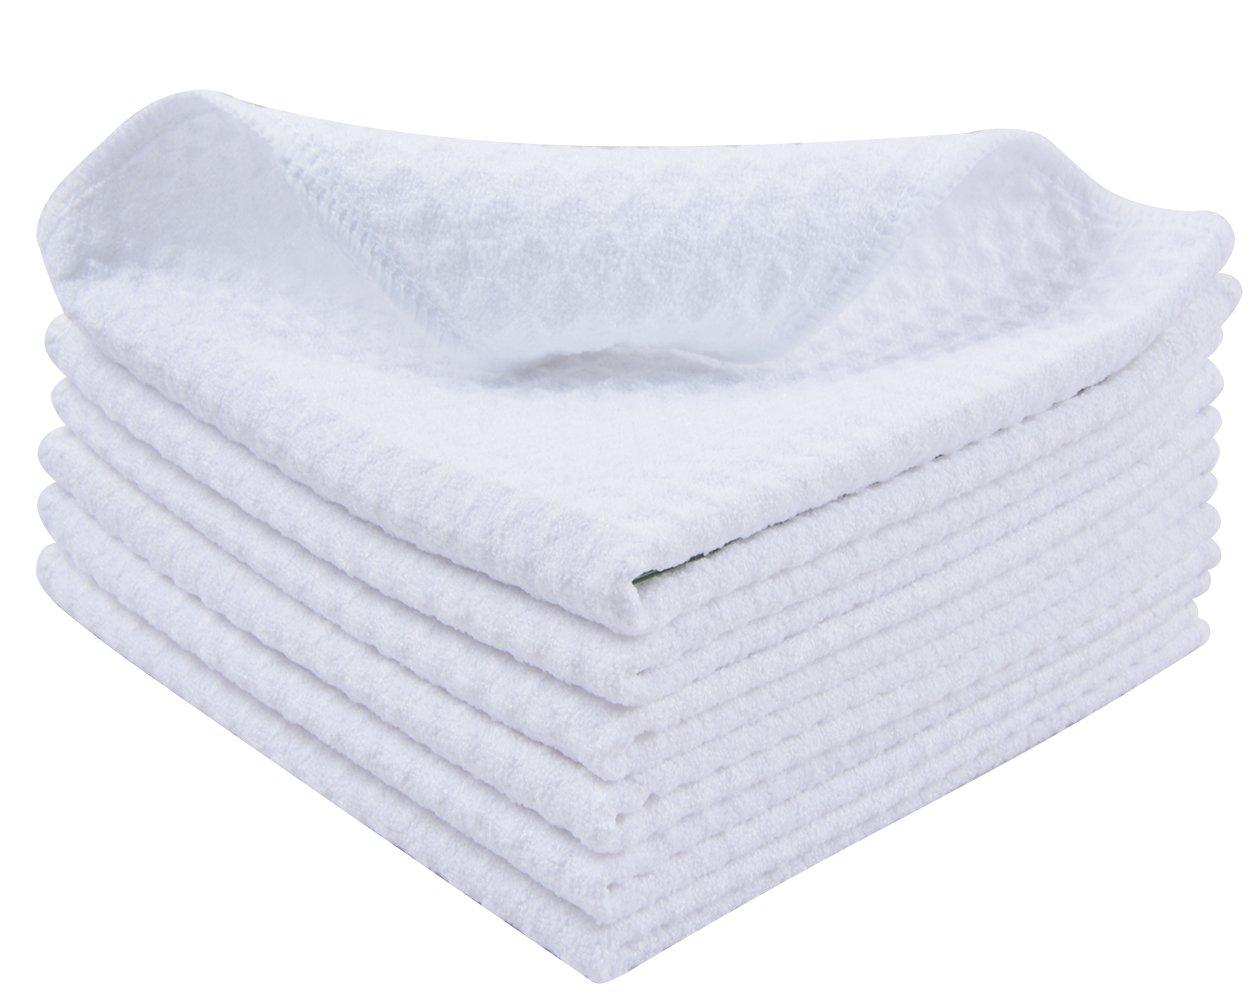 Sinland Thick Microfiber Waffle Weave Dish Cloths Dishcloths Washcloths 13inch X 13inch White